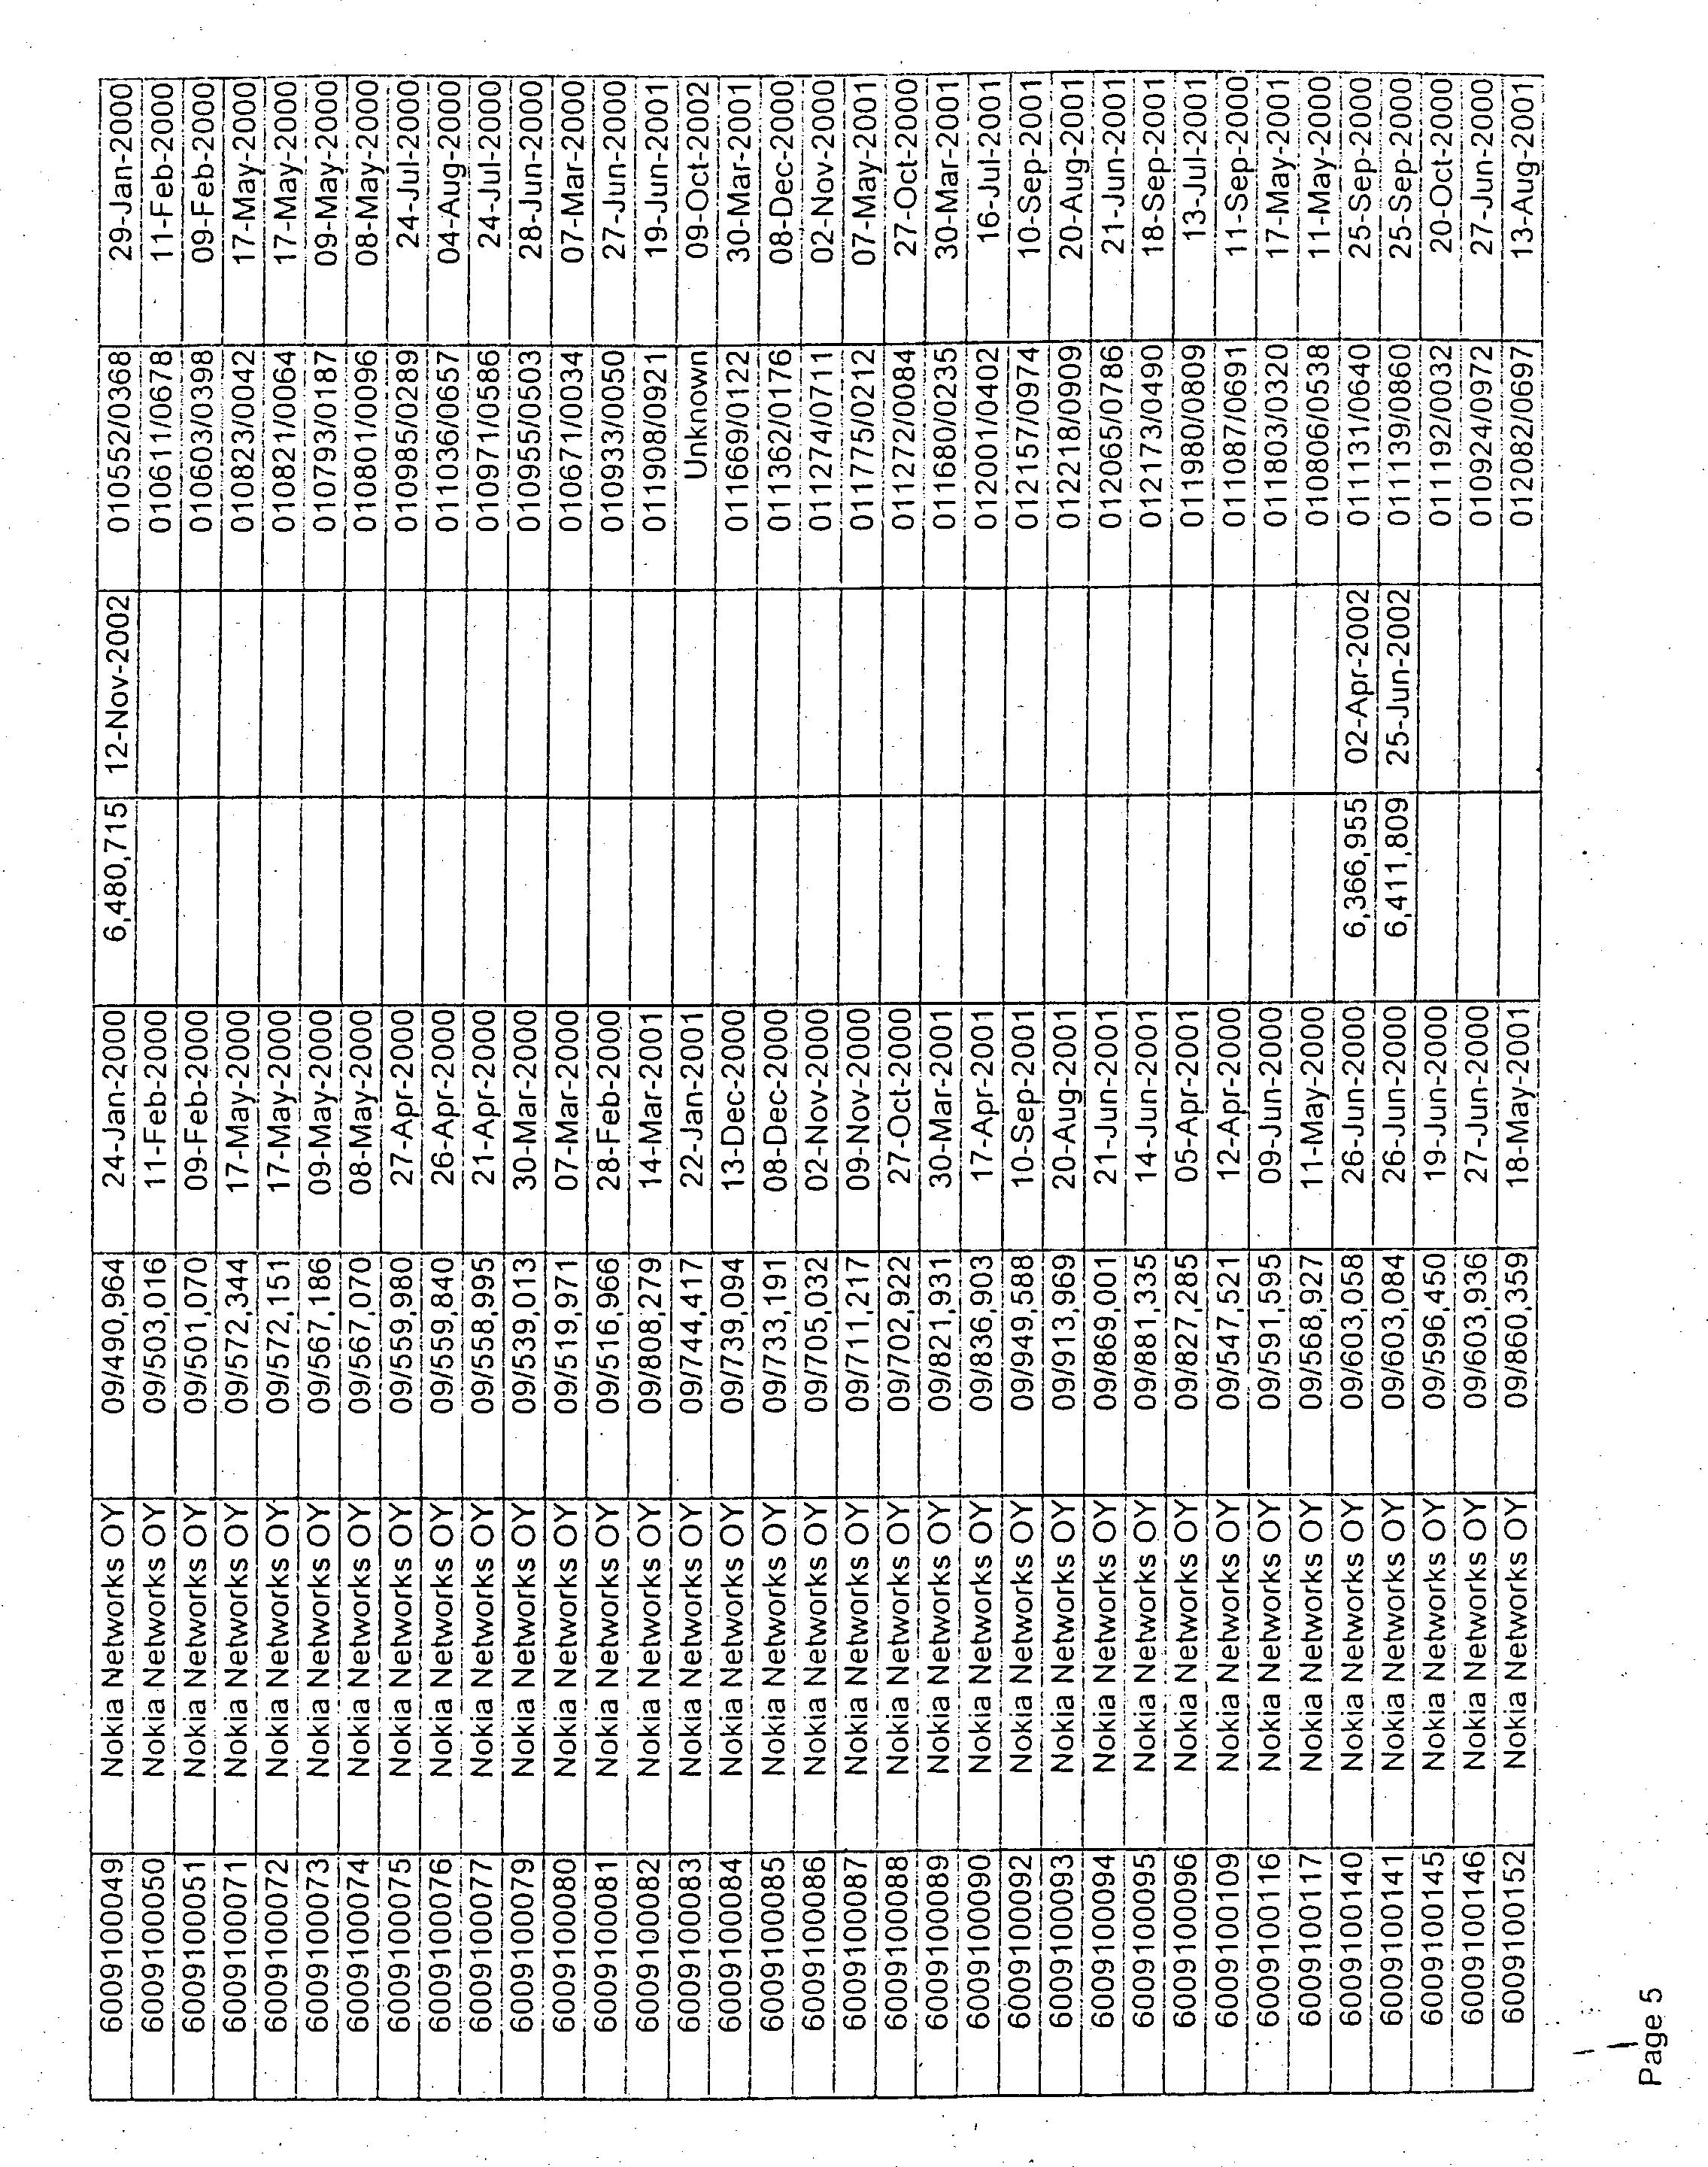 Figure US20030125024A1-20030703-P00005